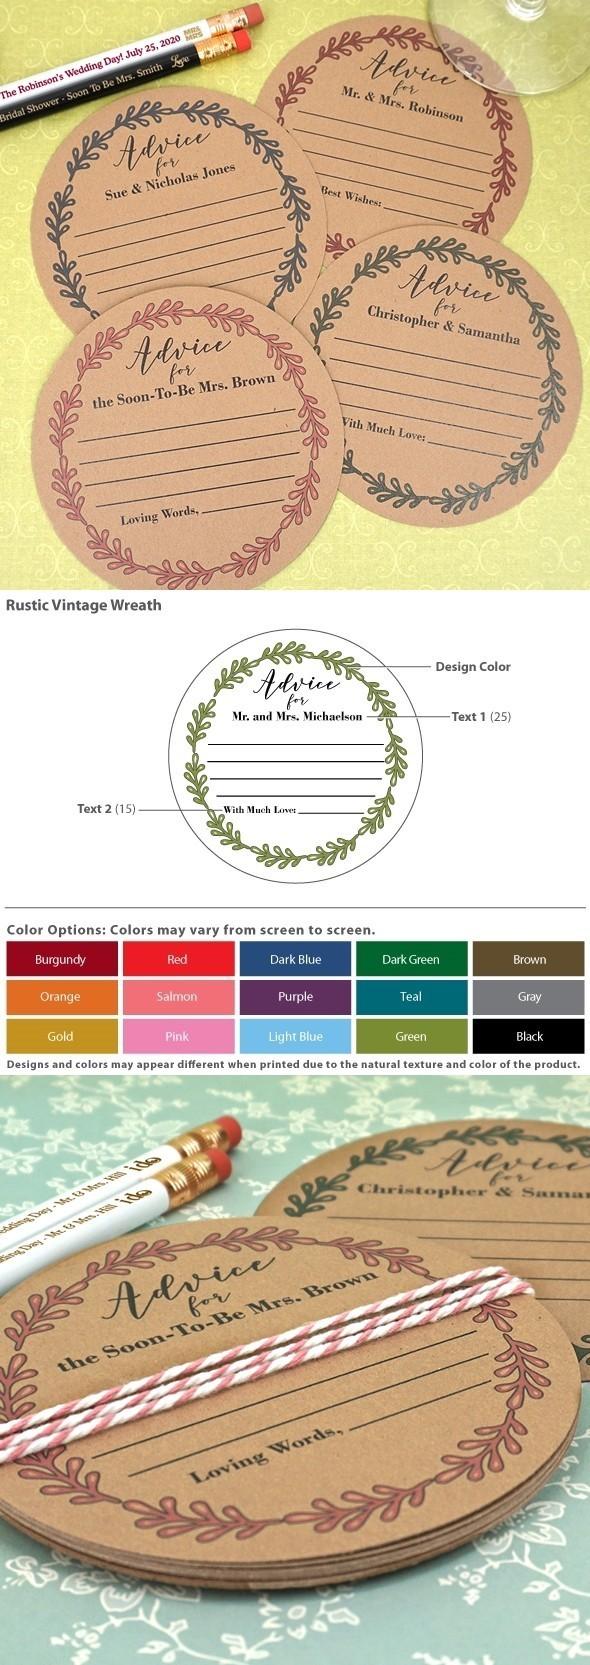 Personalized Rustic Vintage Wreath Kraft Advice Coasters (15 Colors)